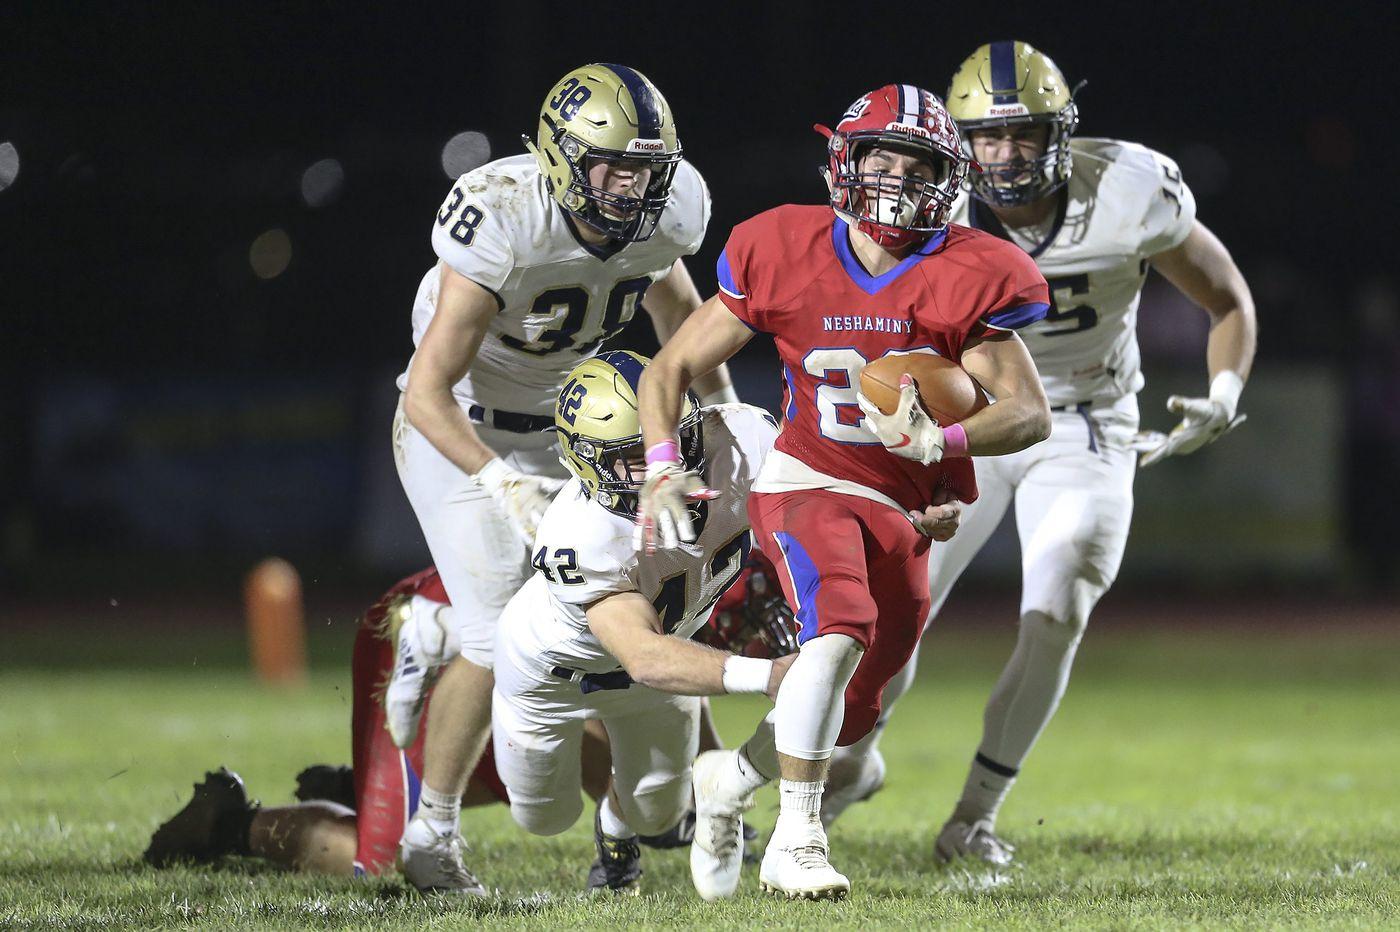 Luke Hitchen, Neshaminy quiet Council Rock South in Suburban One high school football triumph